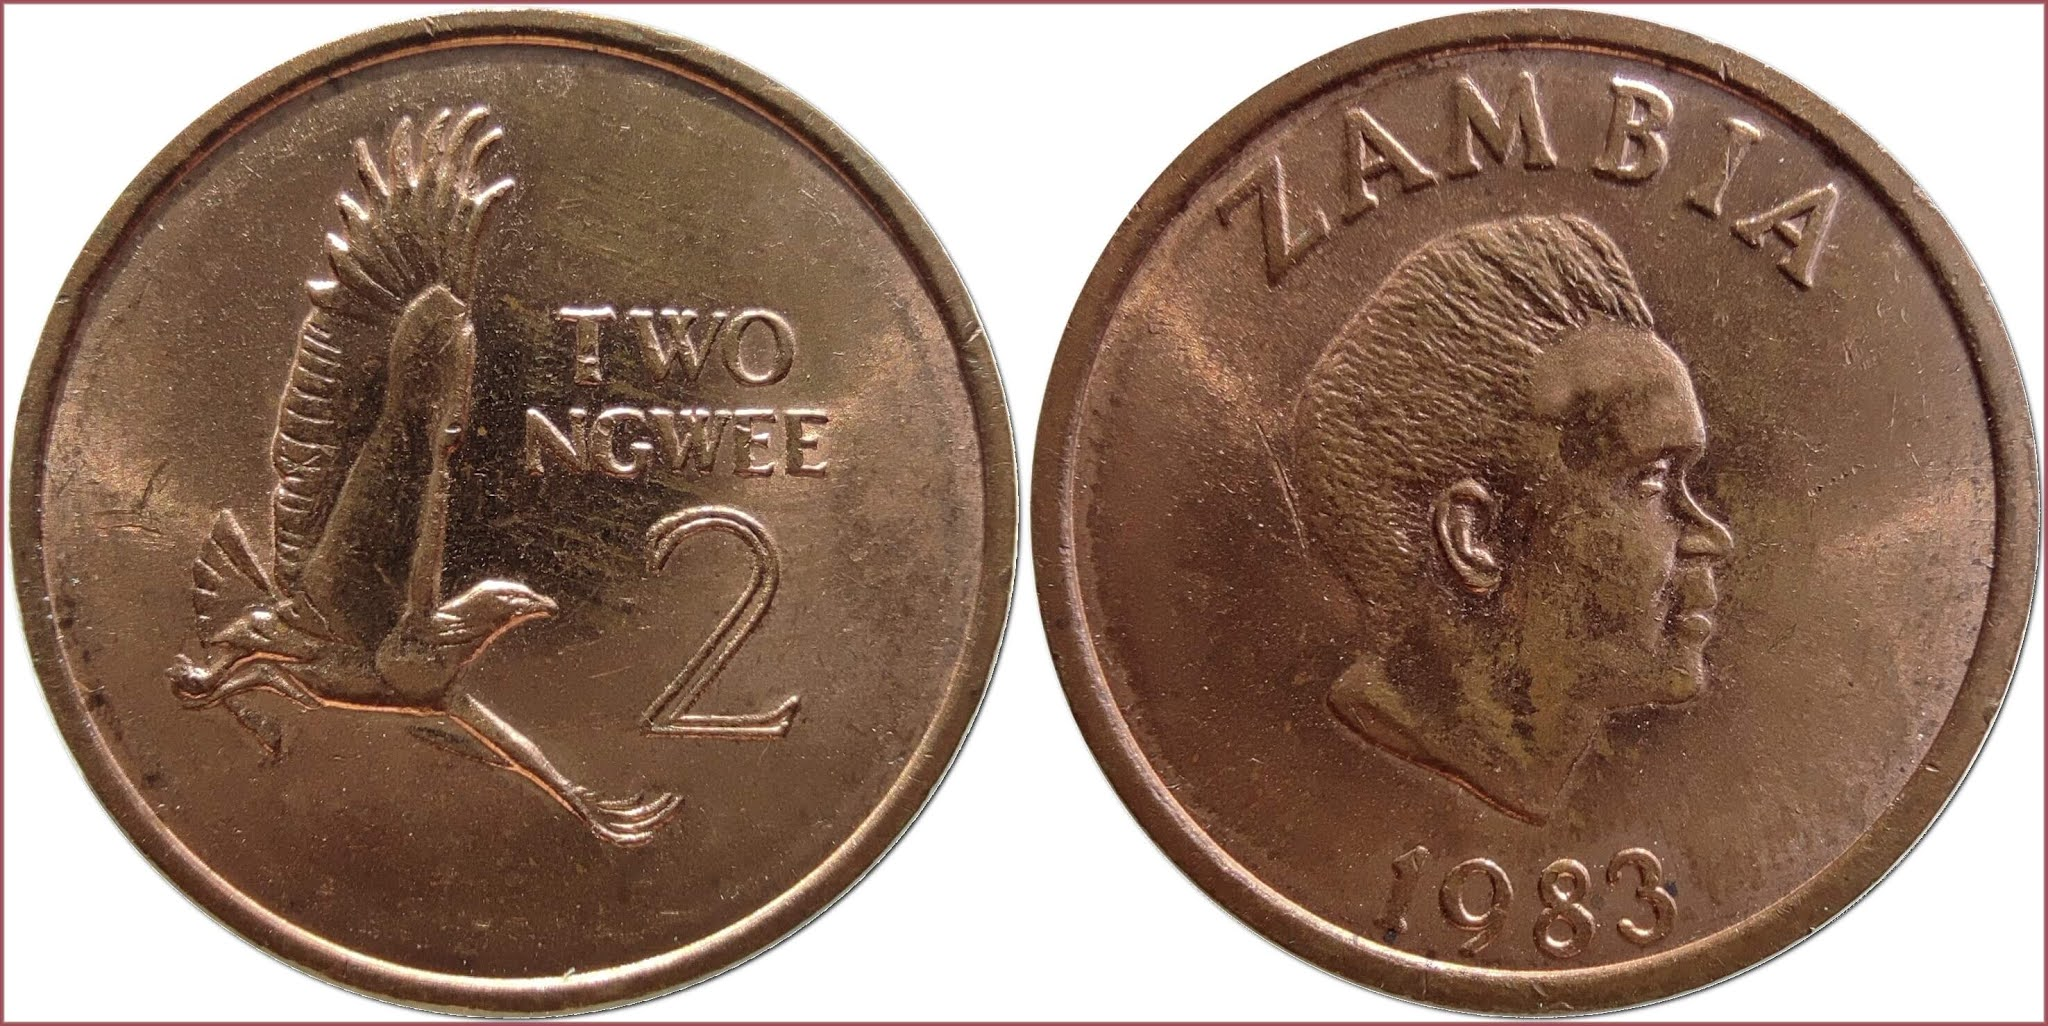 2 ngwee, 1983: Republic of Zambia